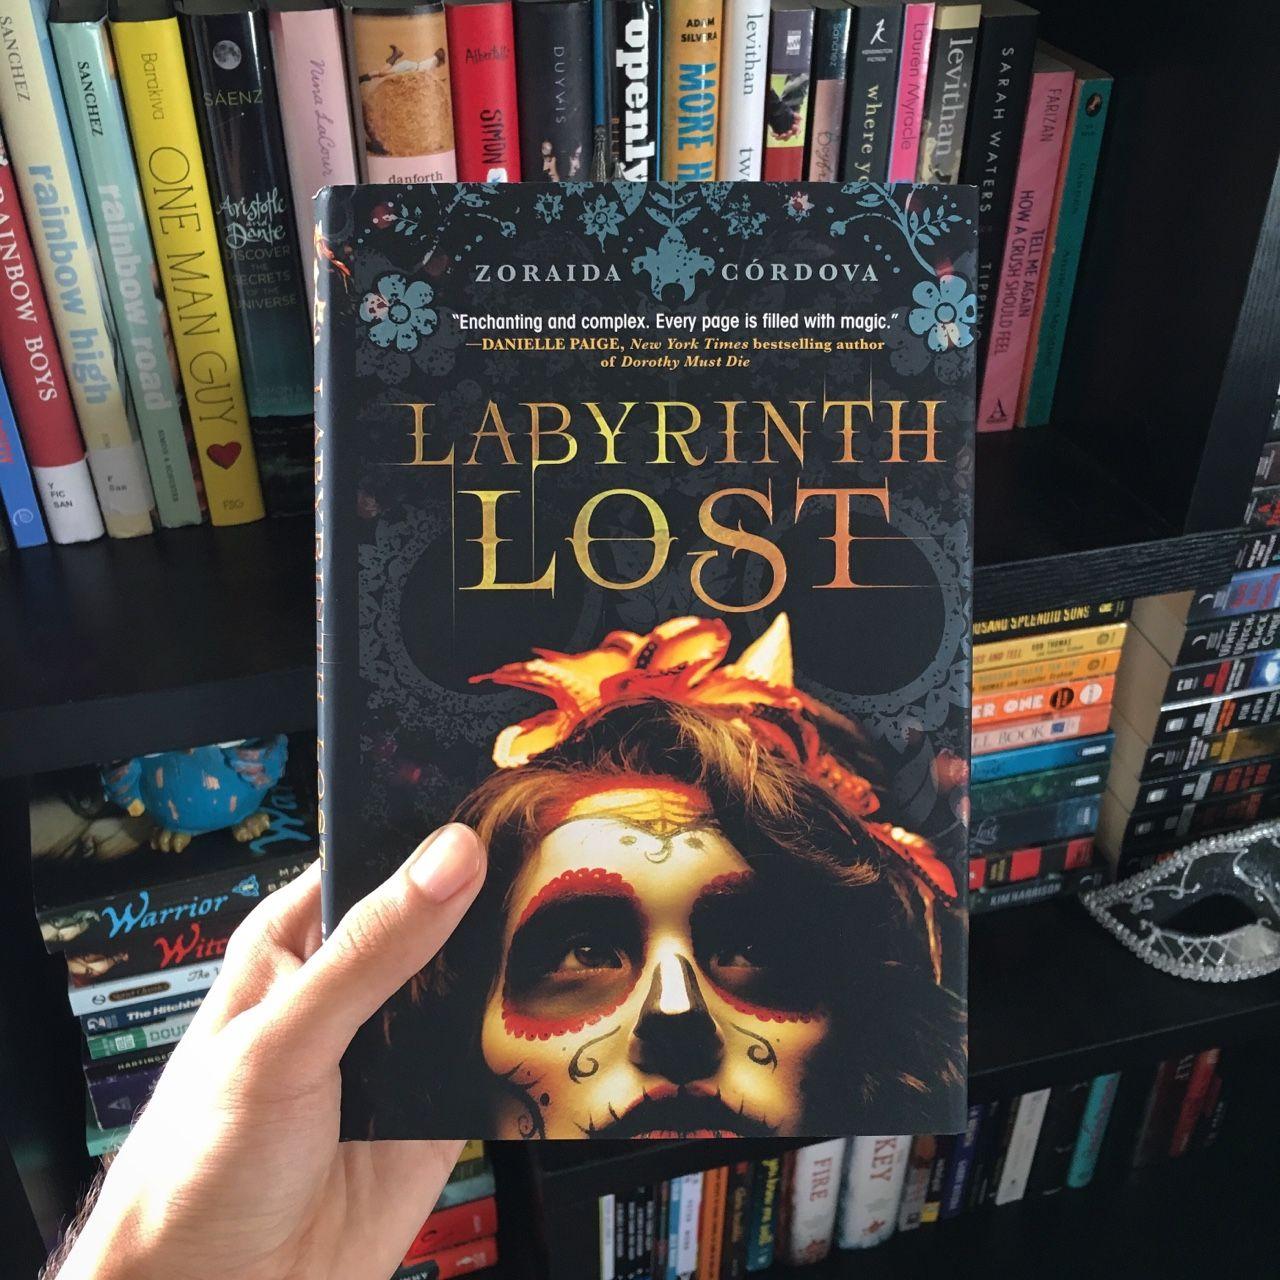 Lesbian latina novel